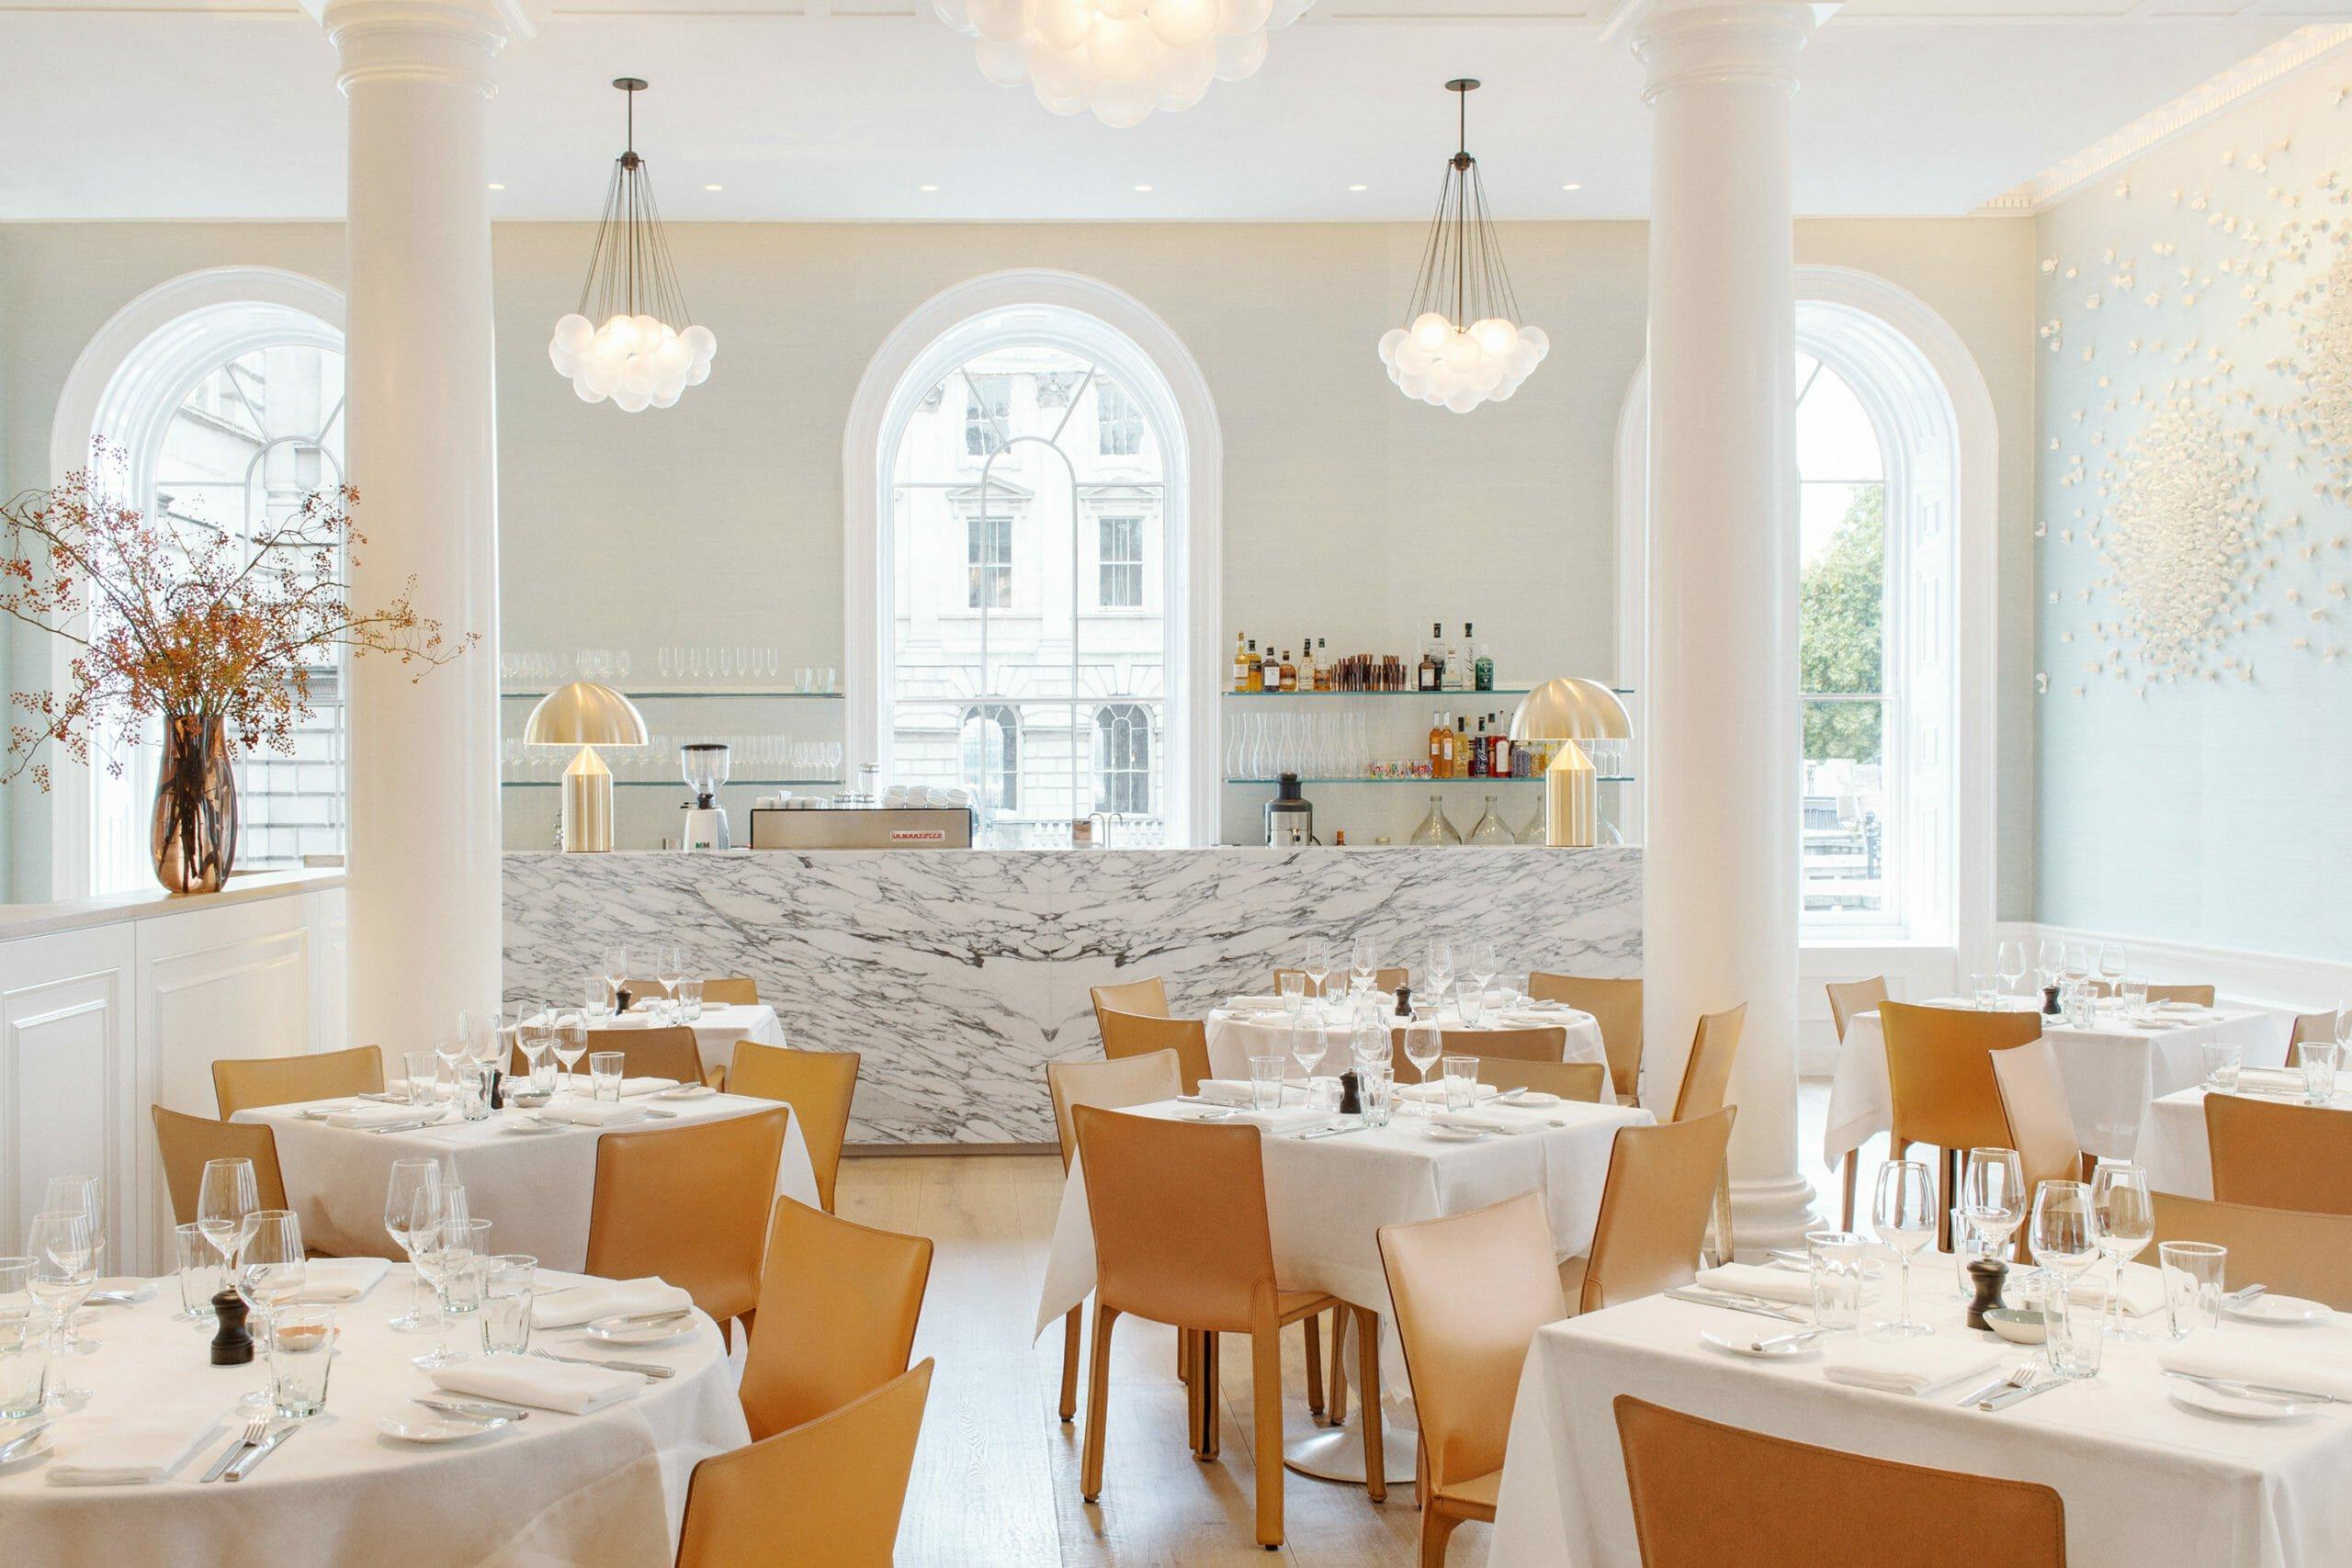 Romantic restaurants: Spring